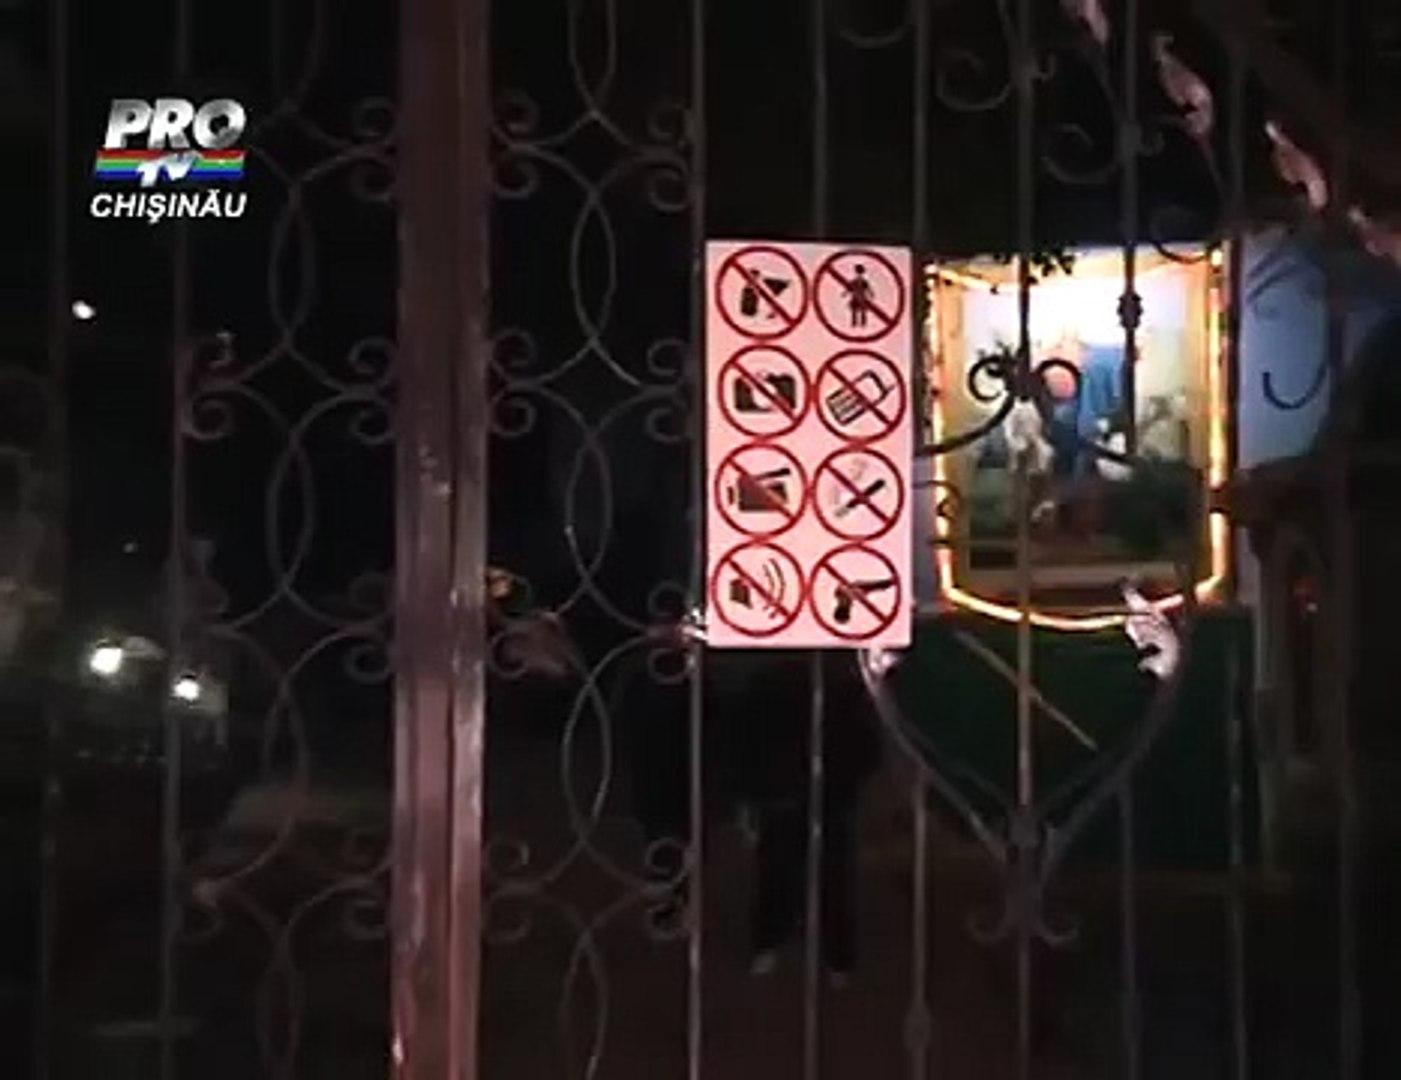 CAMERA ASCUNSA Scene de groaza la Manastirea Saharna (PROTV)